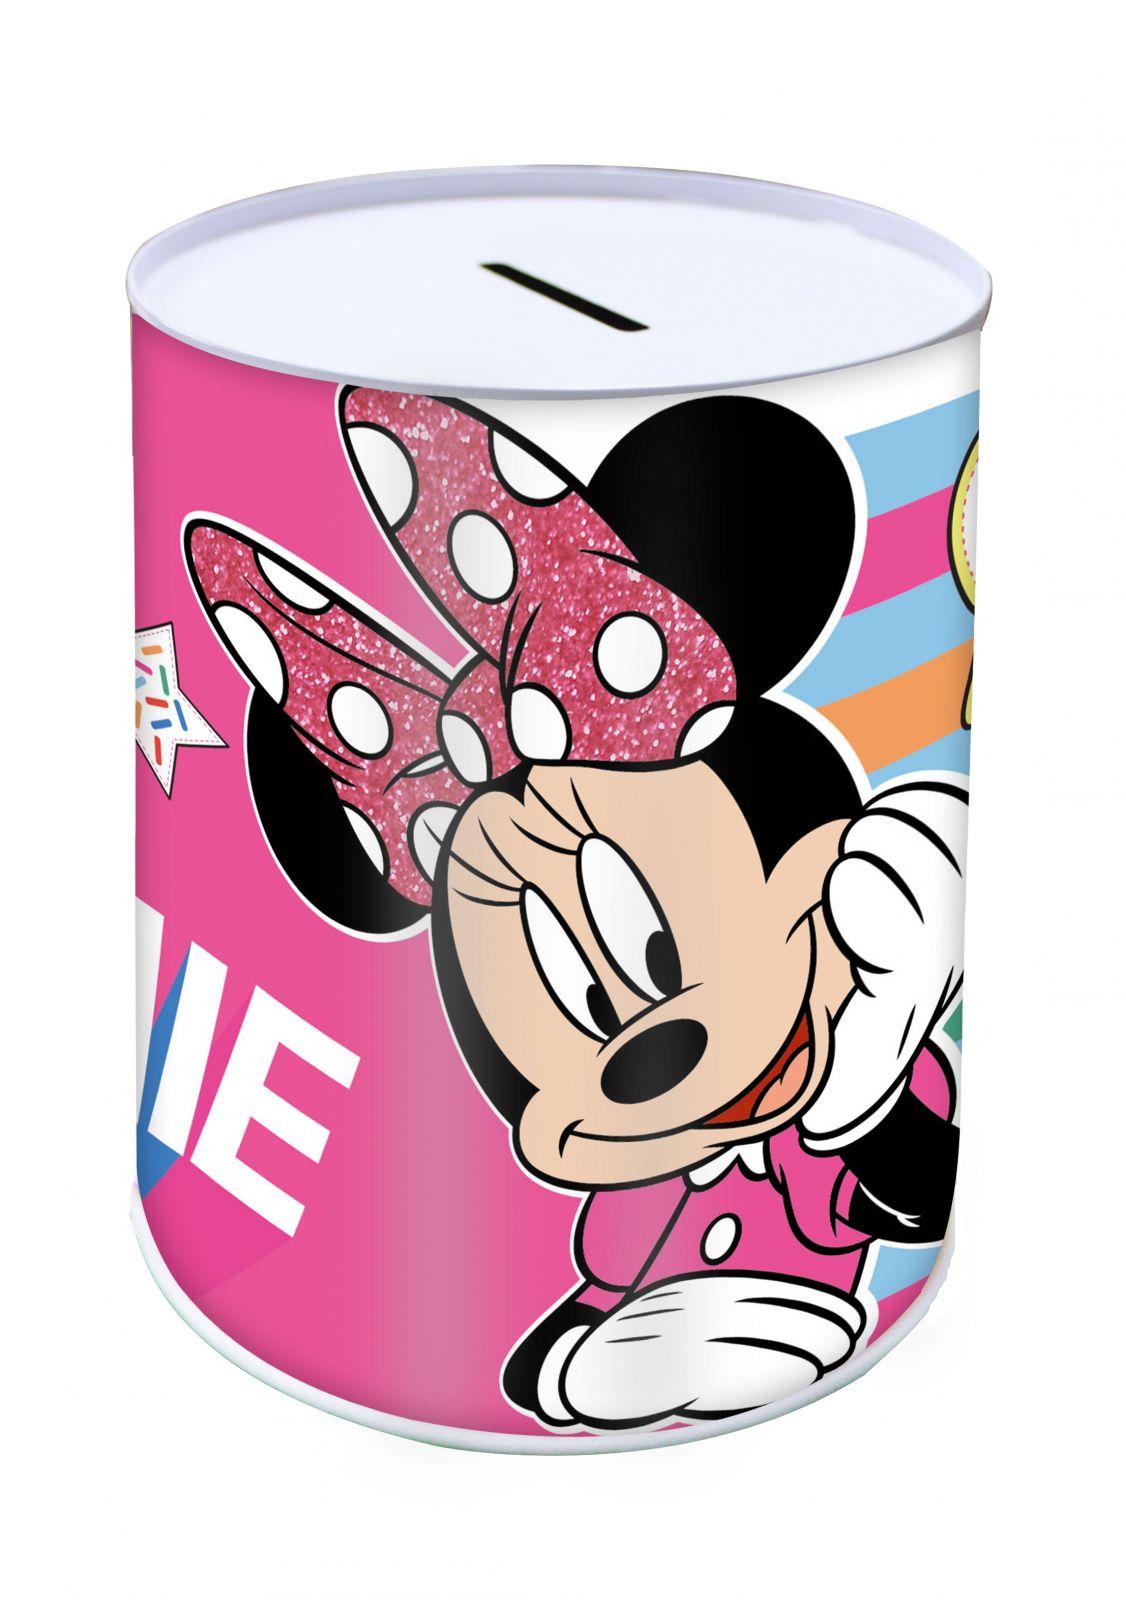 Pokladnička plechovka 10 x 15 cm - Minnie Mouse II Diakakis